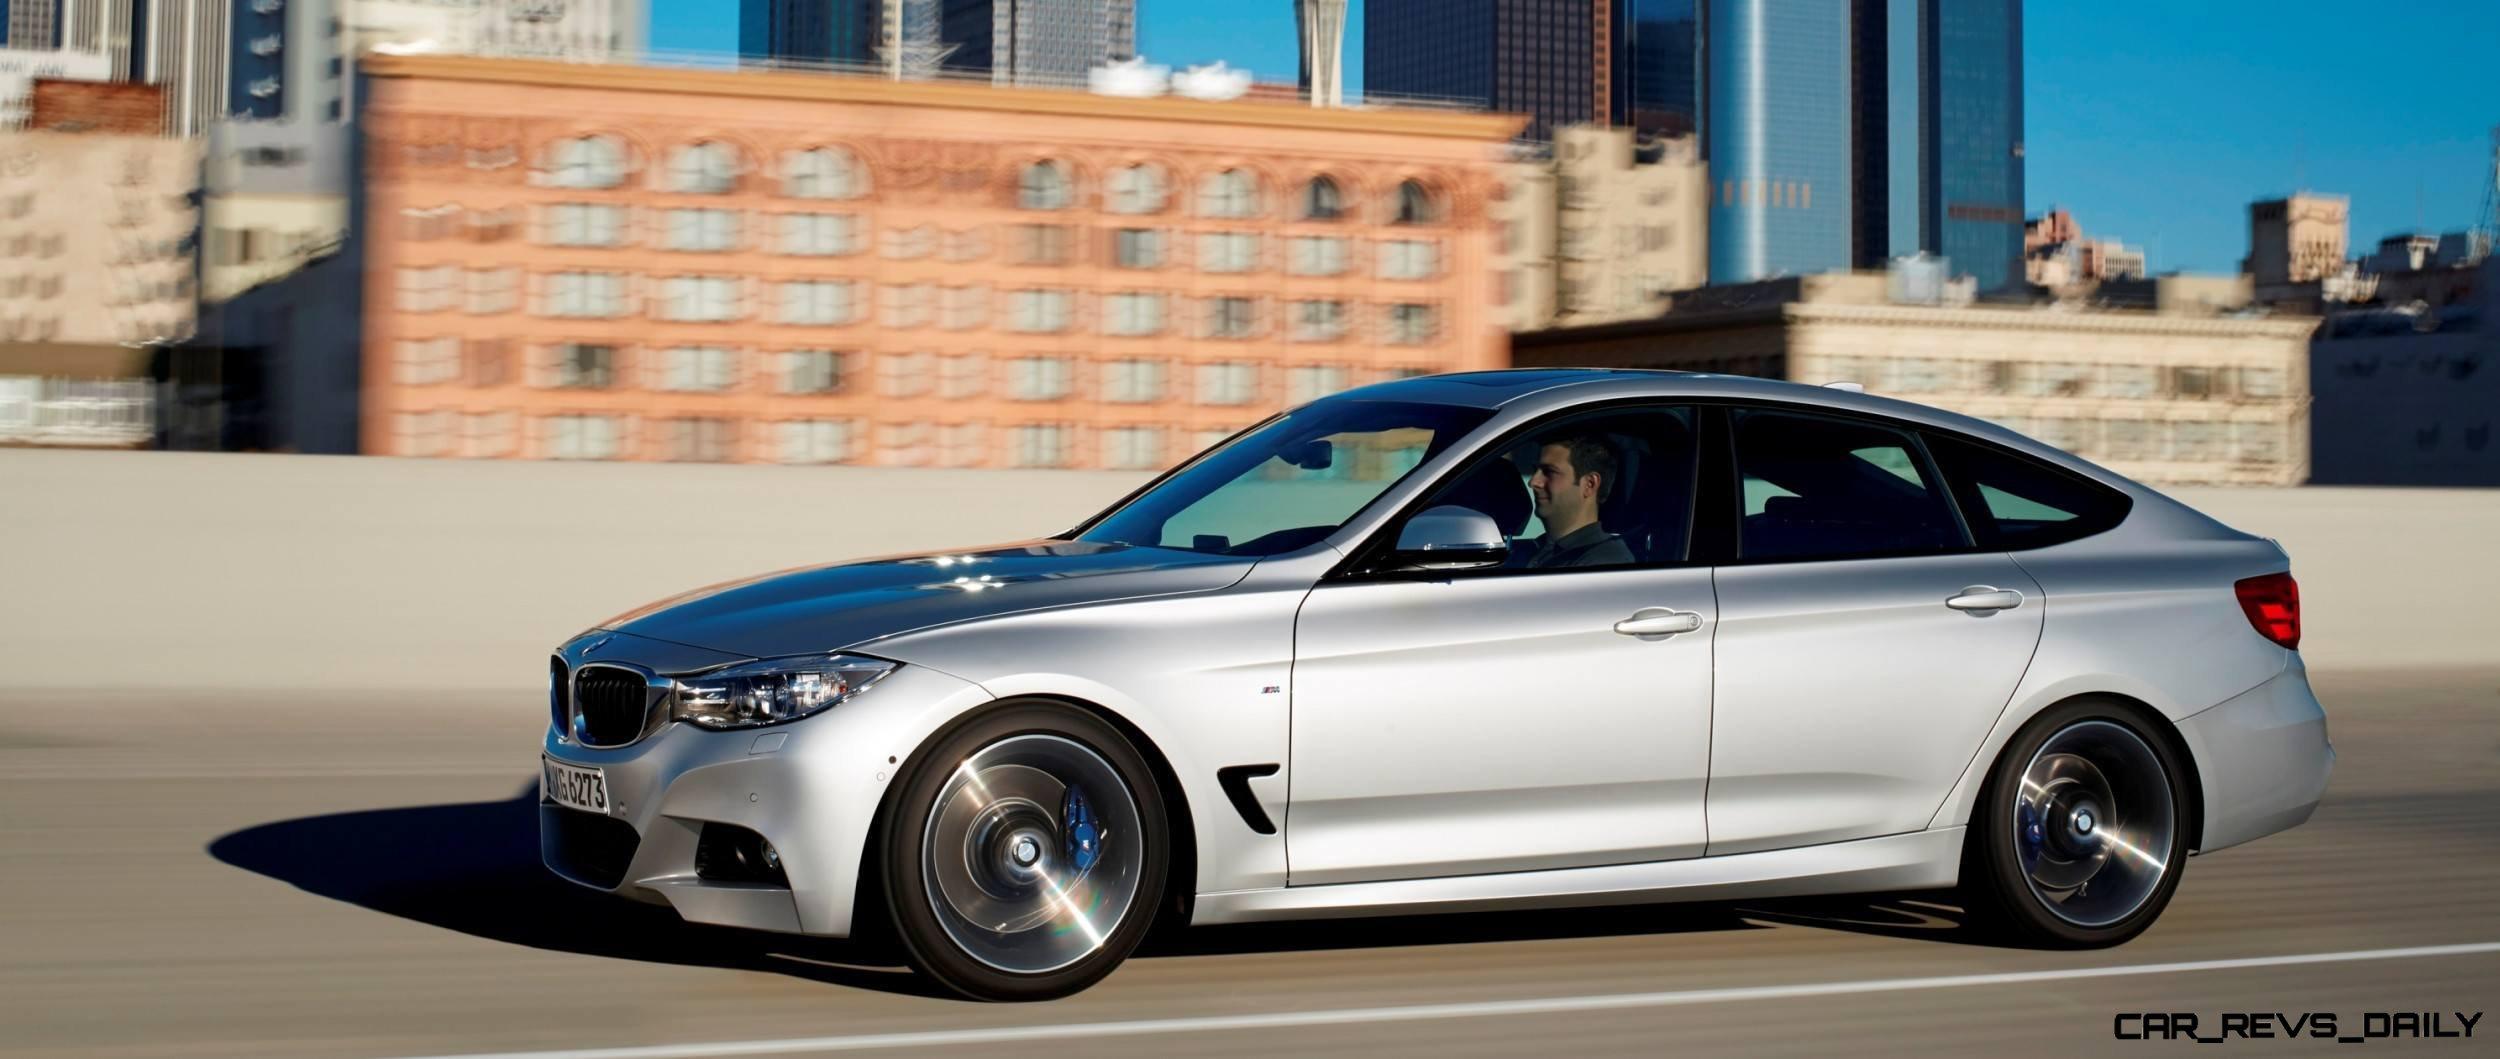 Best Of Awards BMW I GT M Sport Miles At MPH - 2014 bmw 335i price